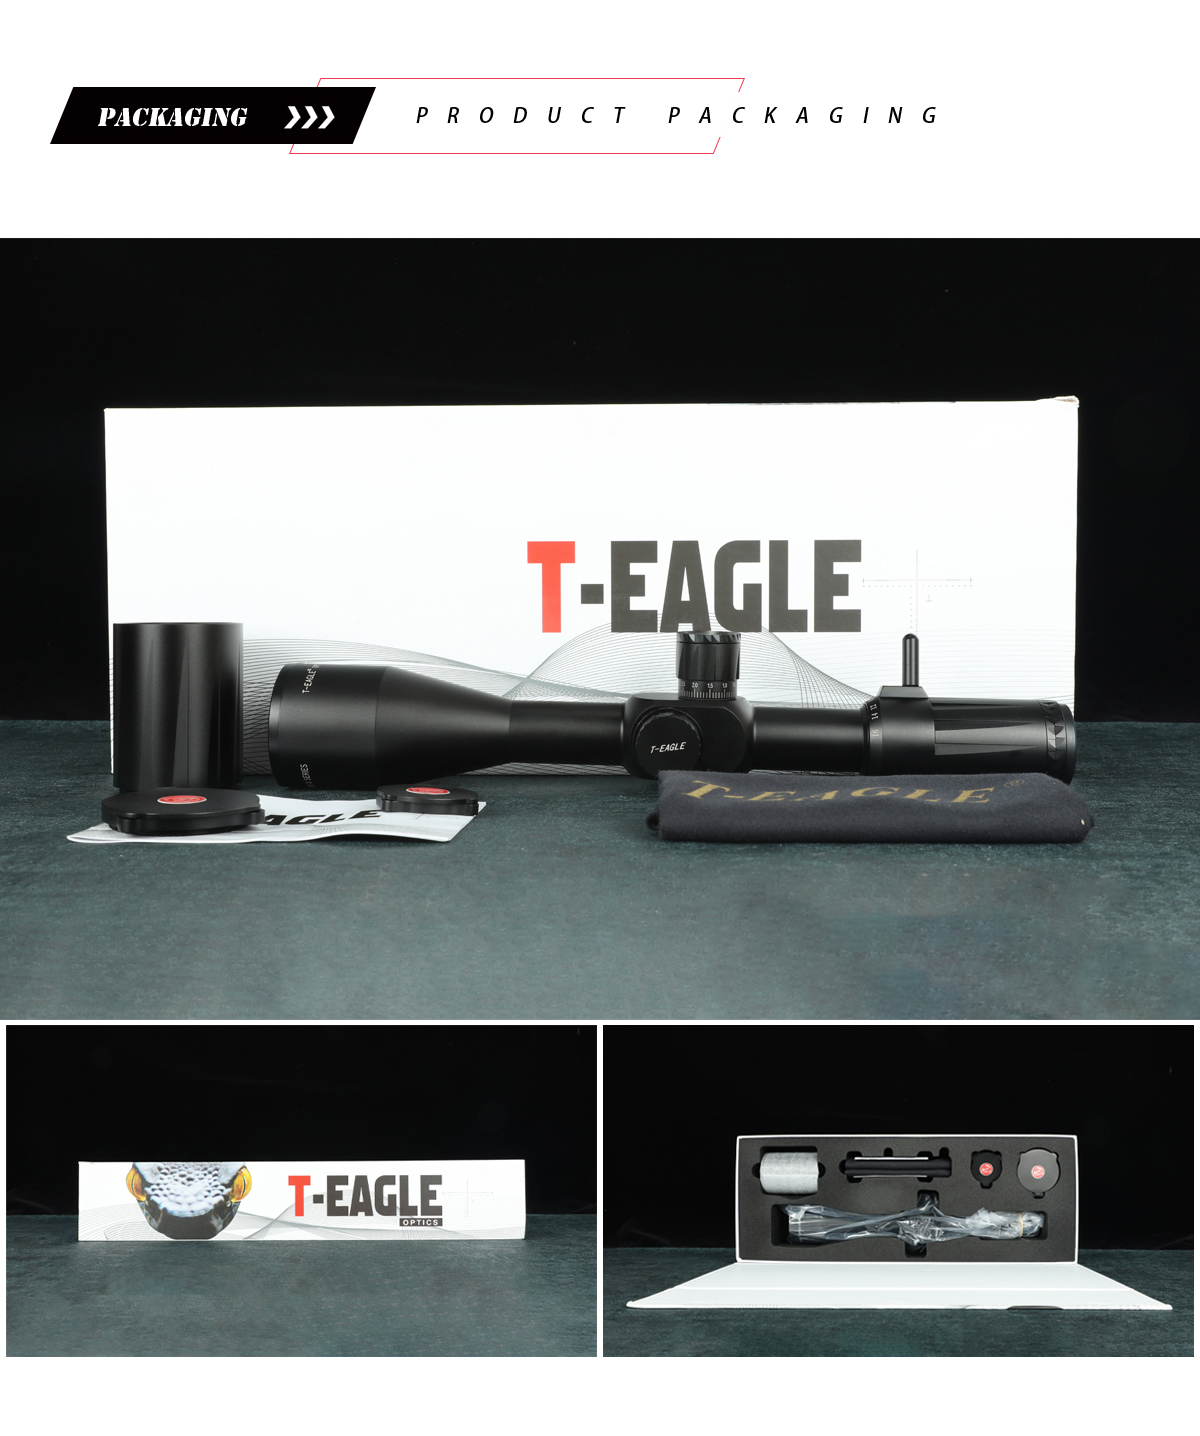 Best Hunting Scope Reticle T-EAGLE Viper 4-16x50 FFP Riflescope Optical Sight pic-1